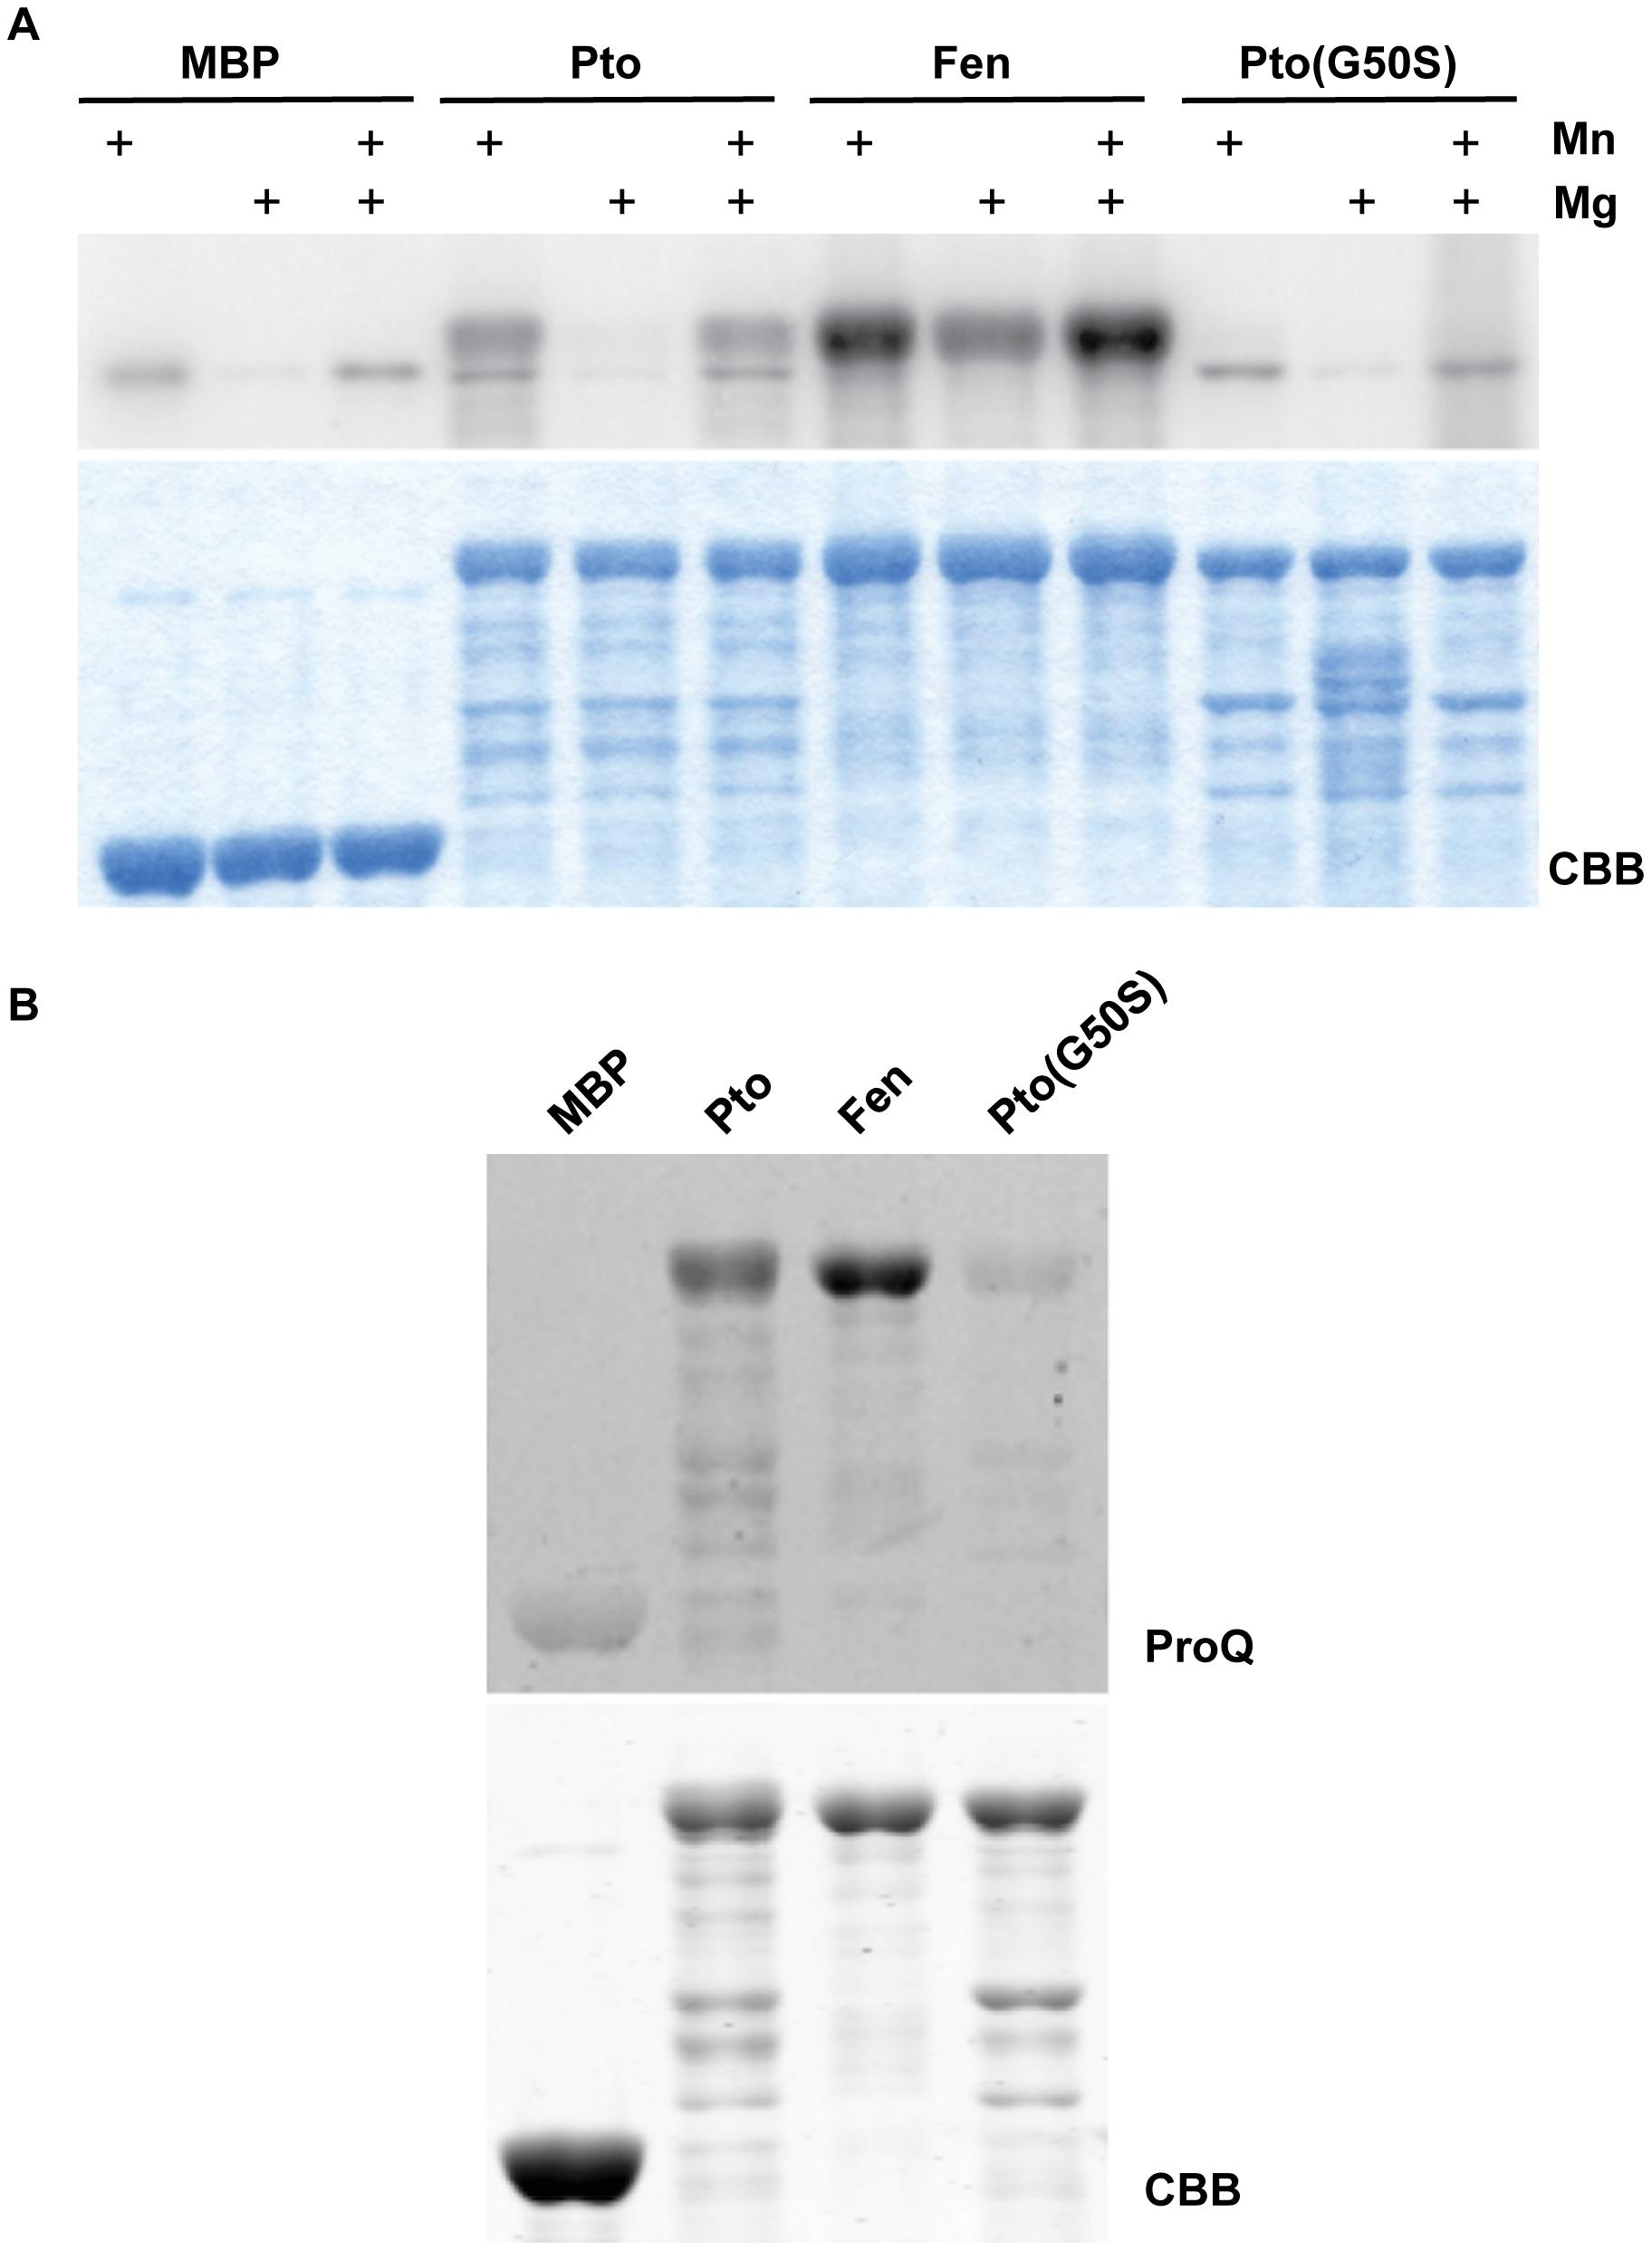 Fen has higher kinase activity than Pto and Pto(G50S) has little or no kinase activity.